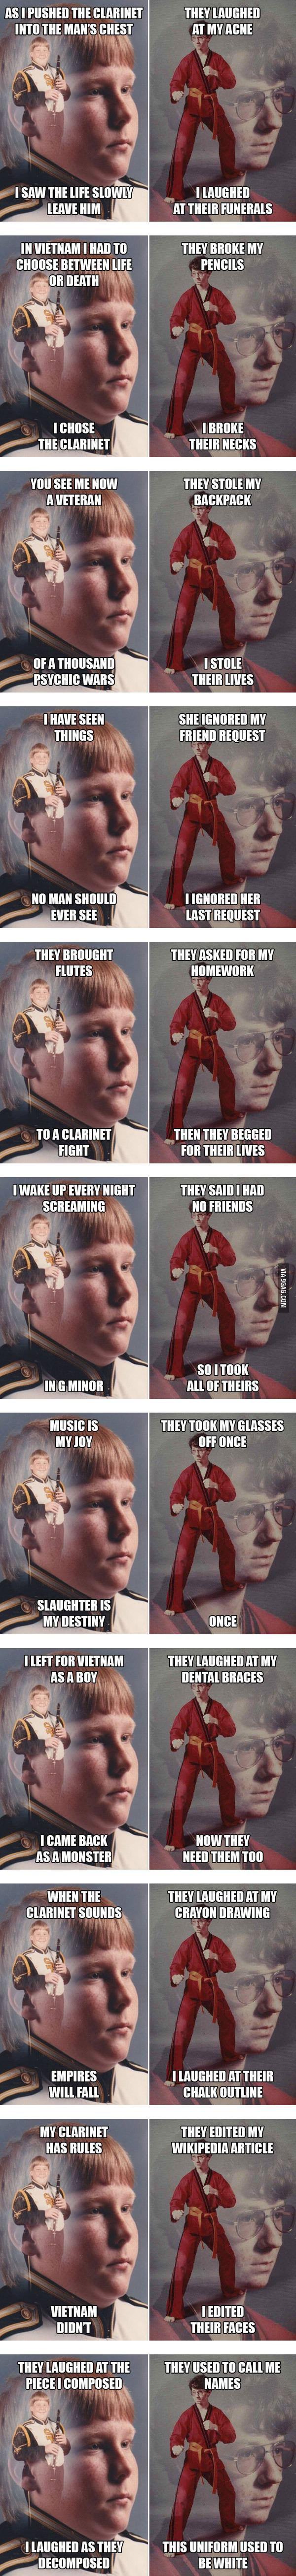 Clarinet Boy vs. Karate Kyle